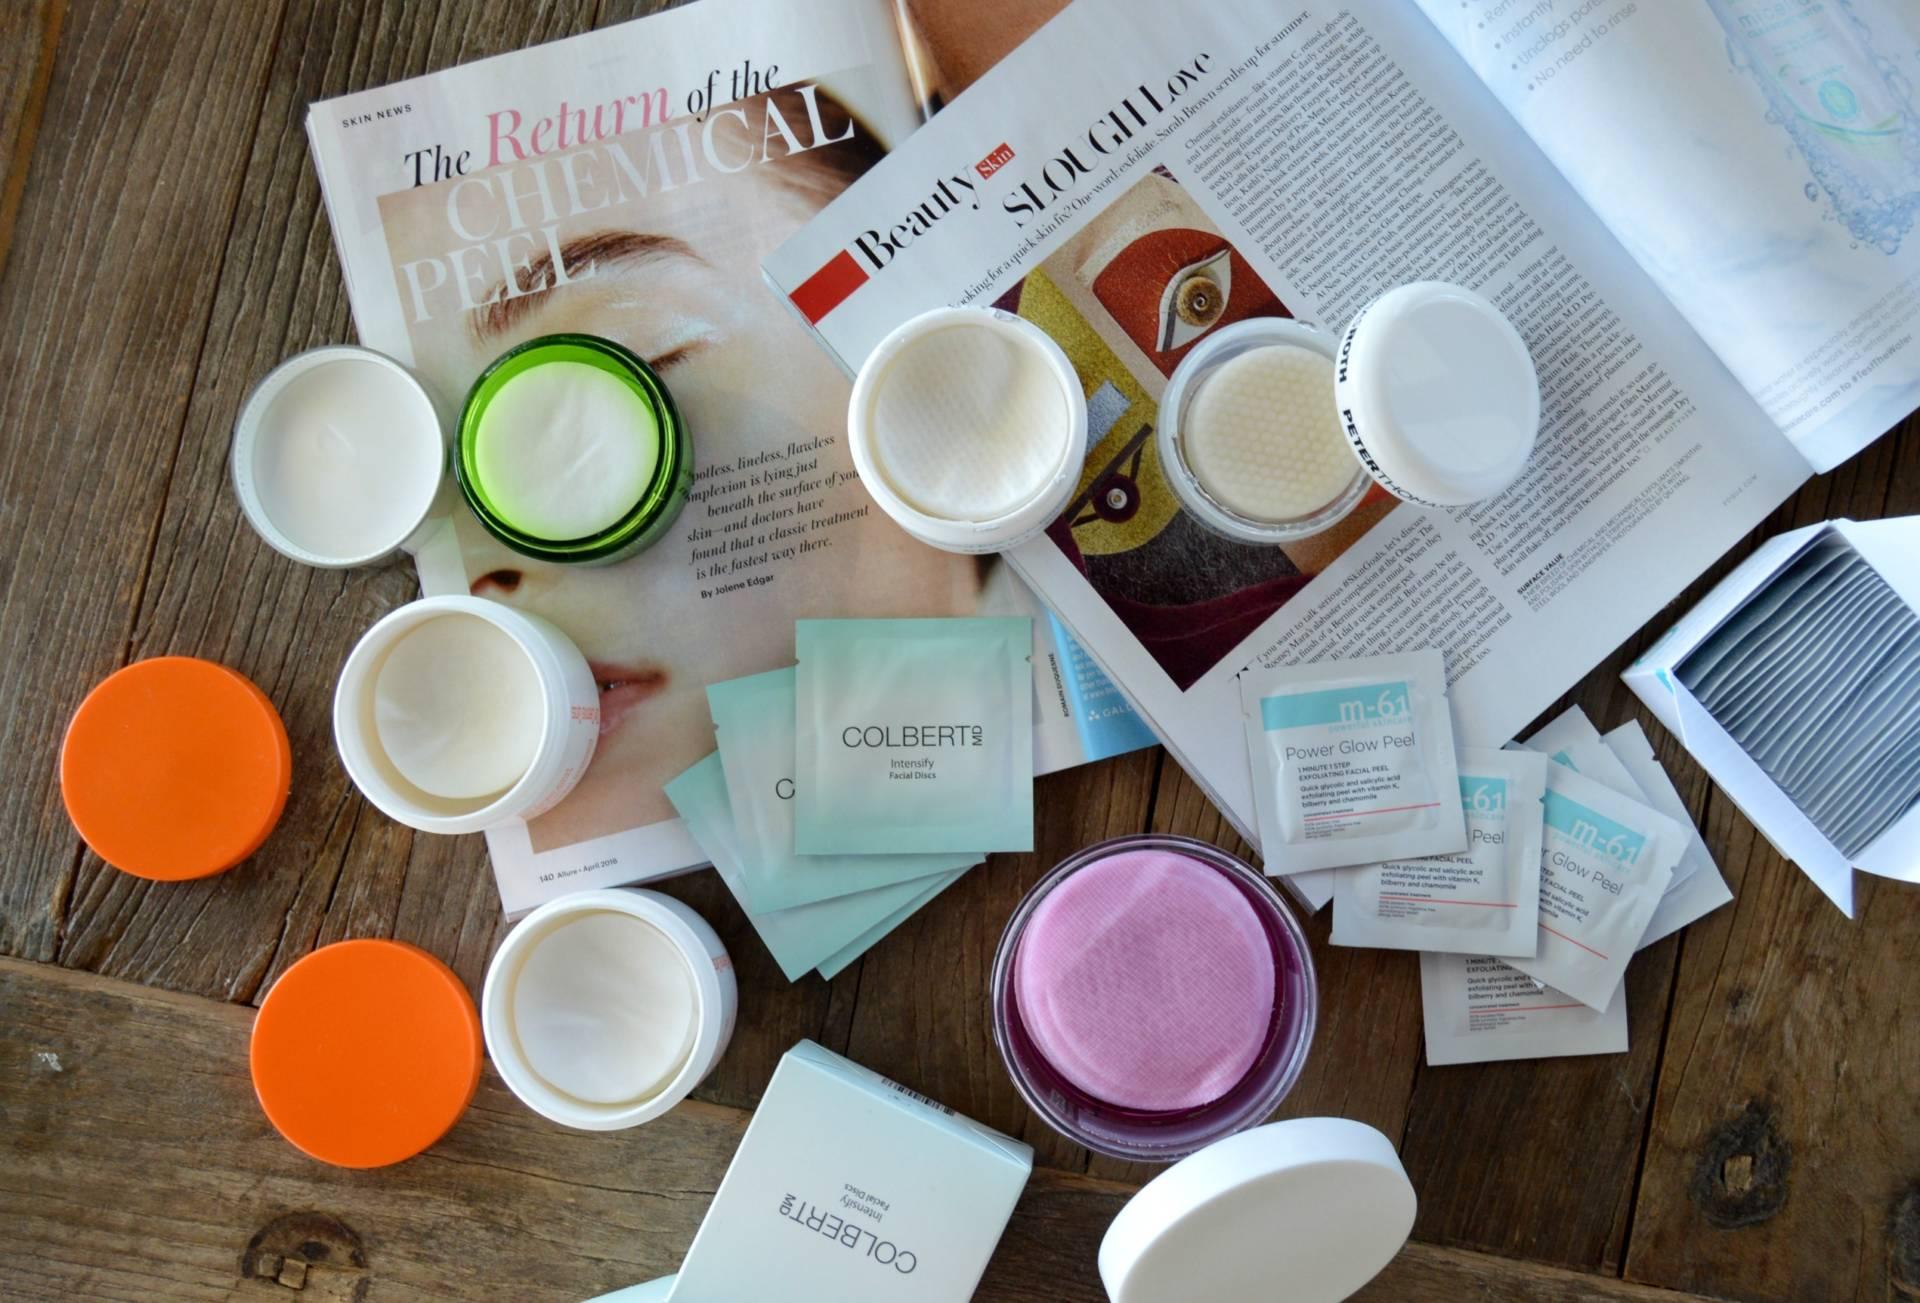 peel pads exfoliate review round up inhautepursuit blogger